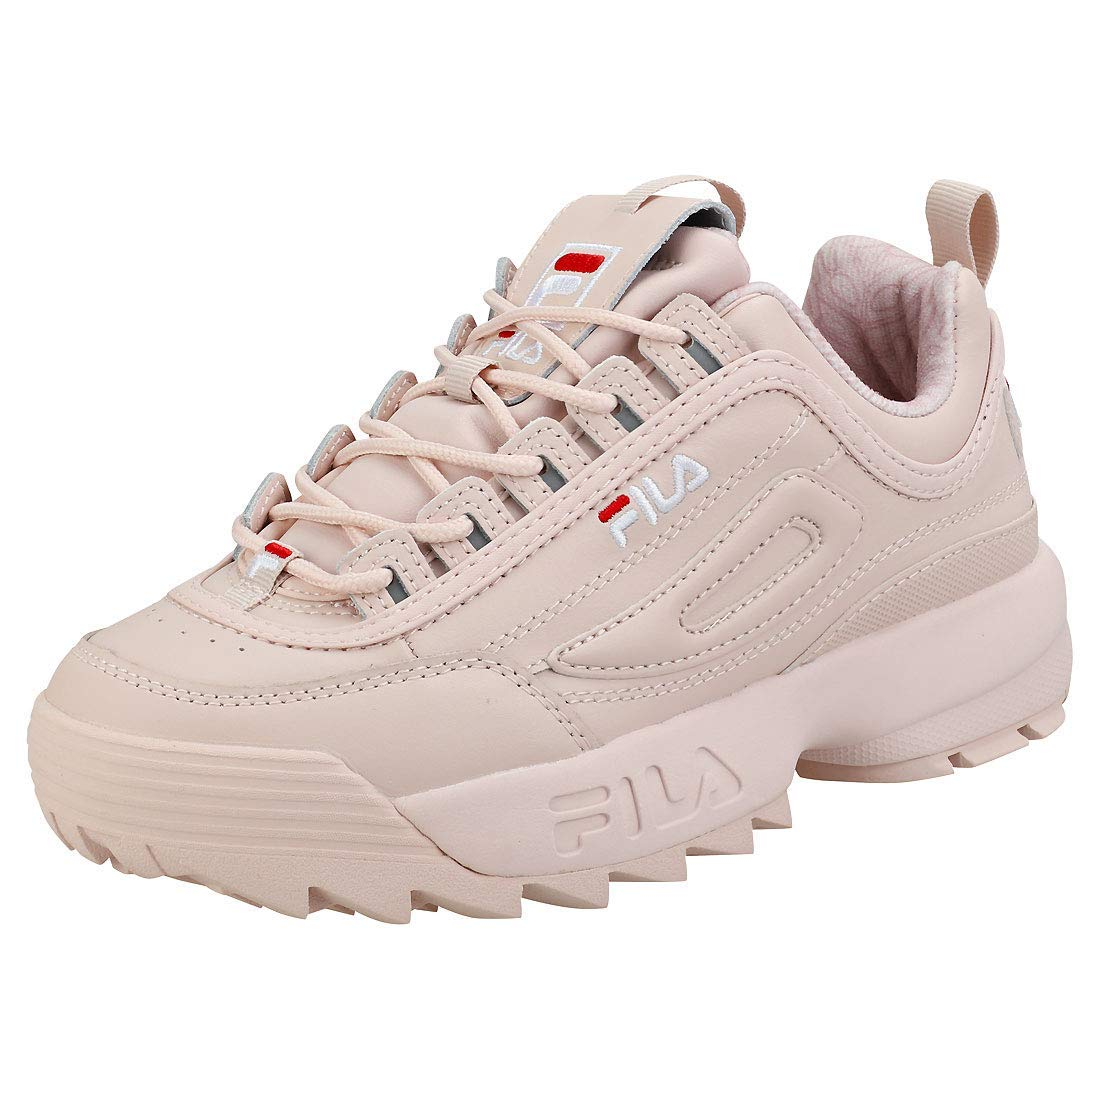 c340ce2cabc Galleon - Fila Women's Disruptor II Premium Sneakers, Peach Blush/White/Fila  Red, 9.5 M US